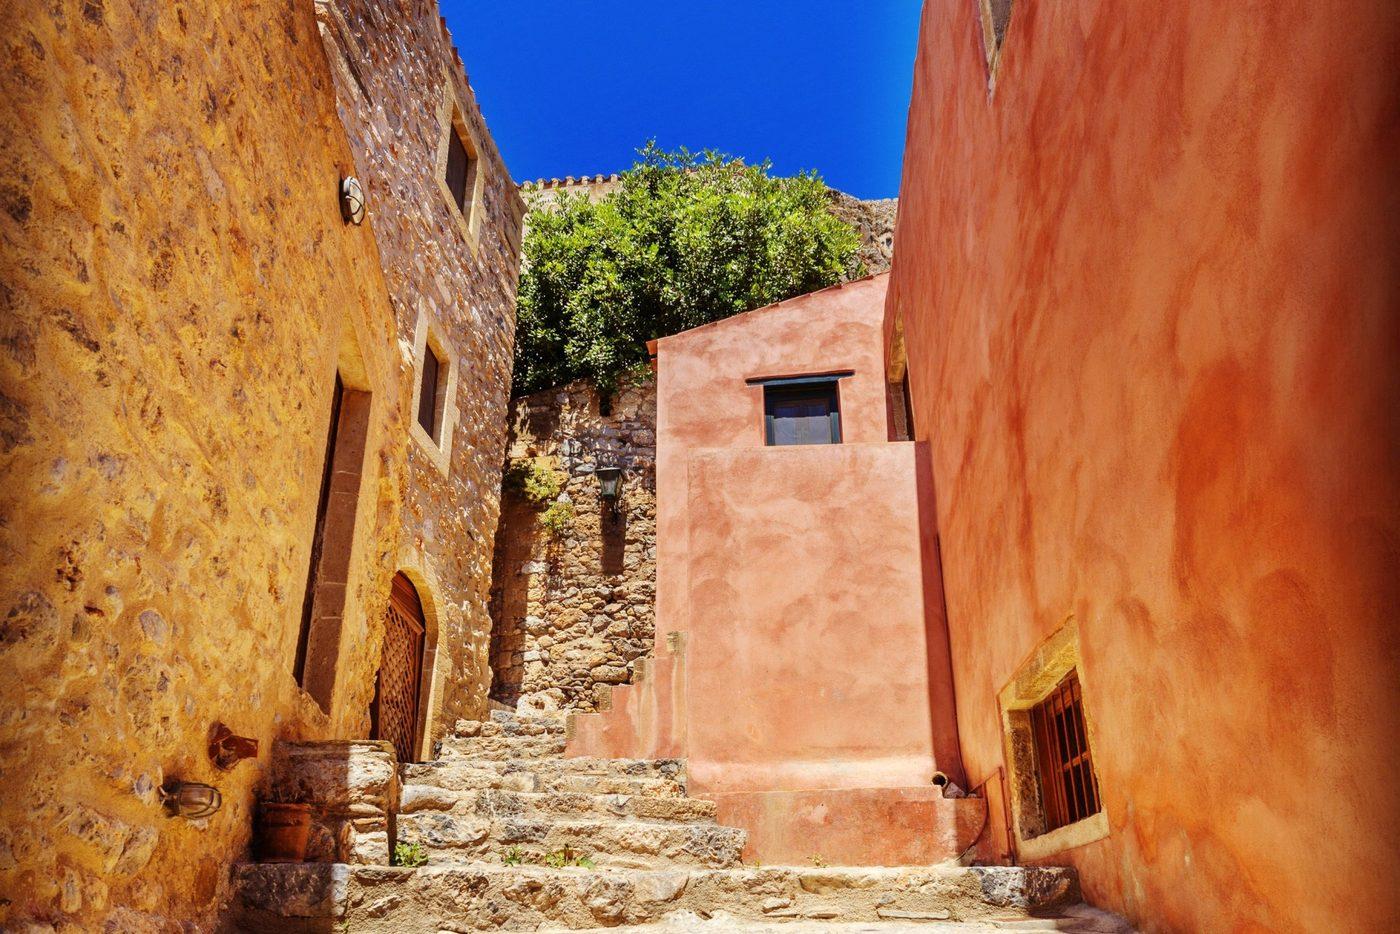 The islet of the Vlacherna Monastery off the coast of Kanoni, Corfu, Greece